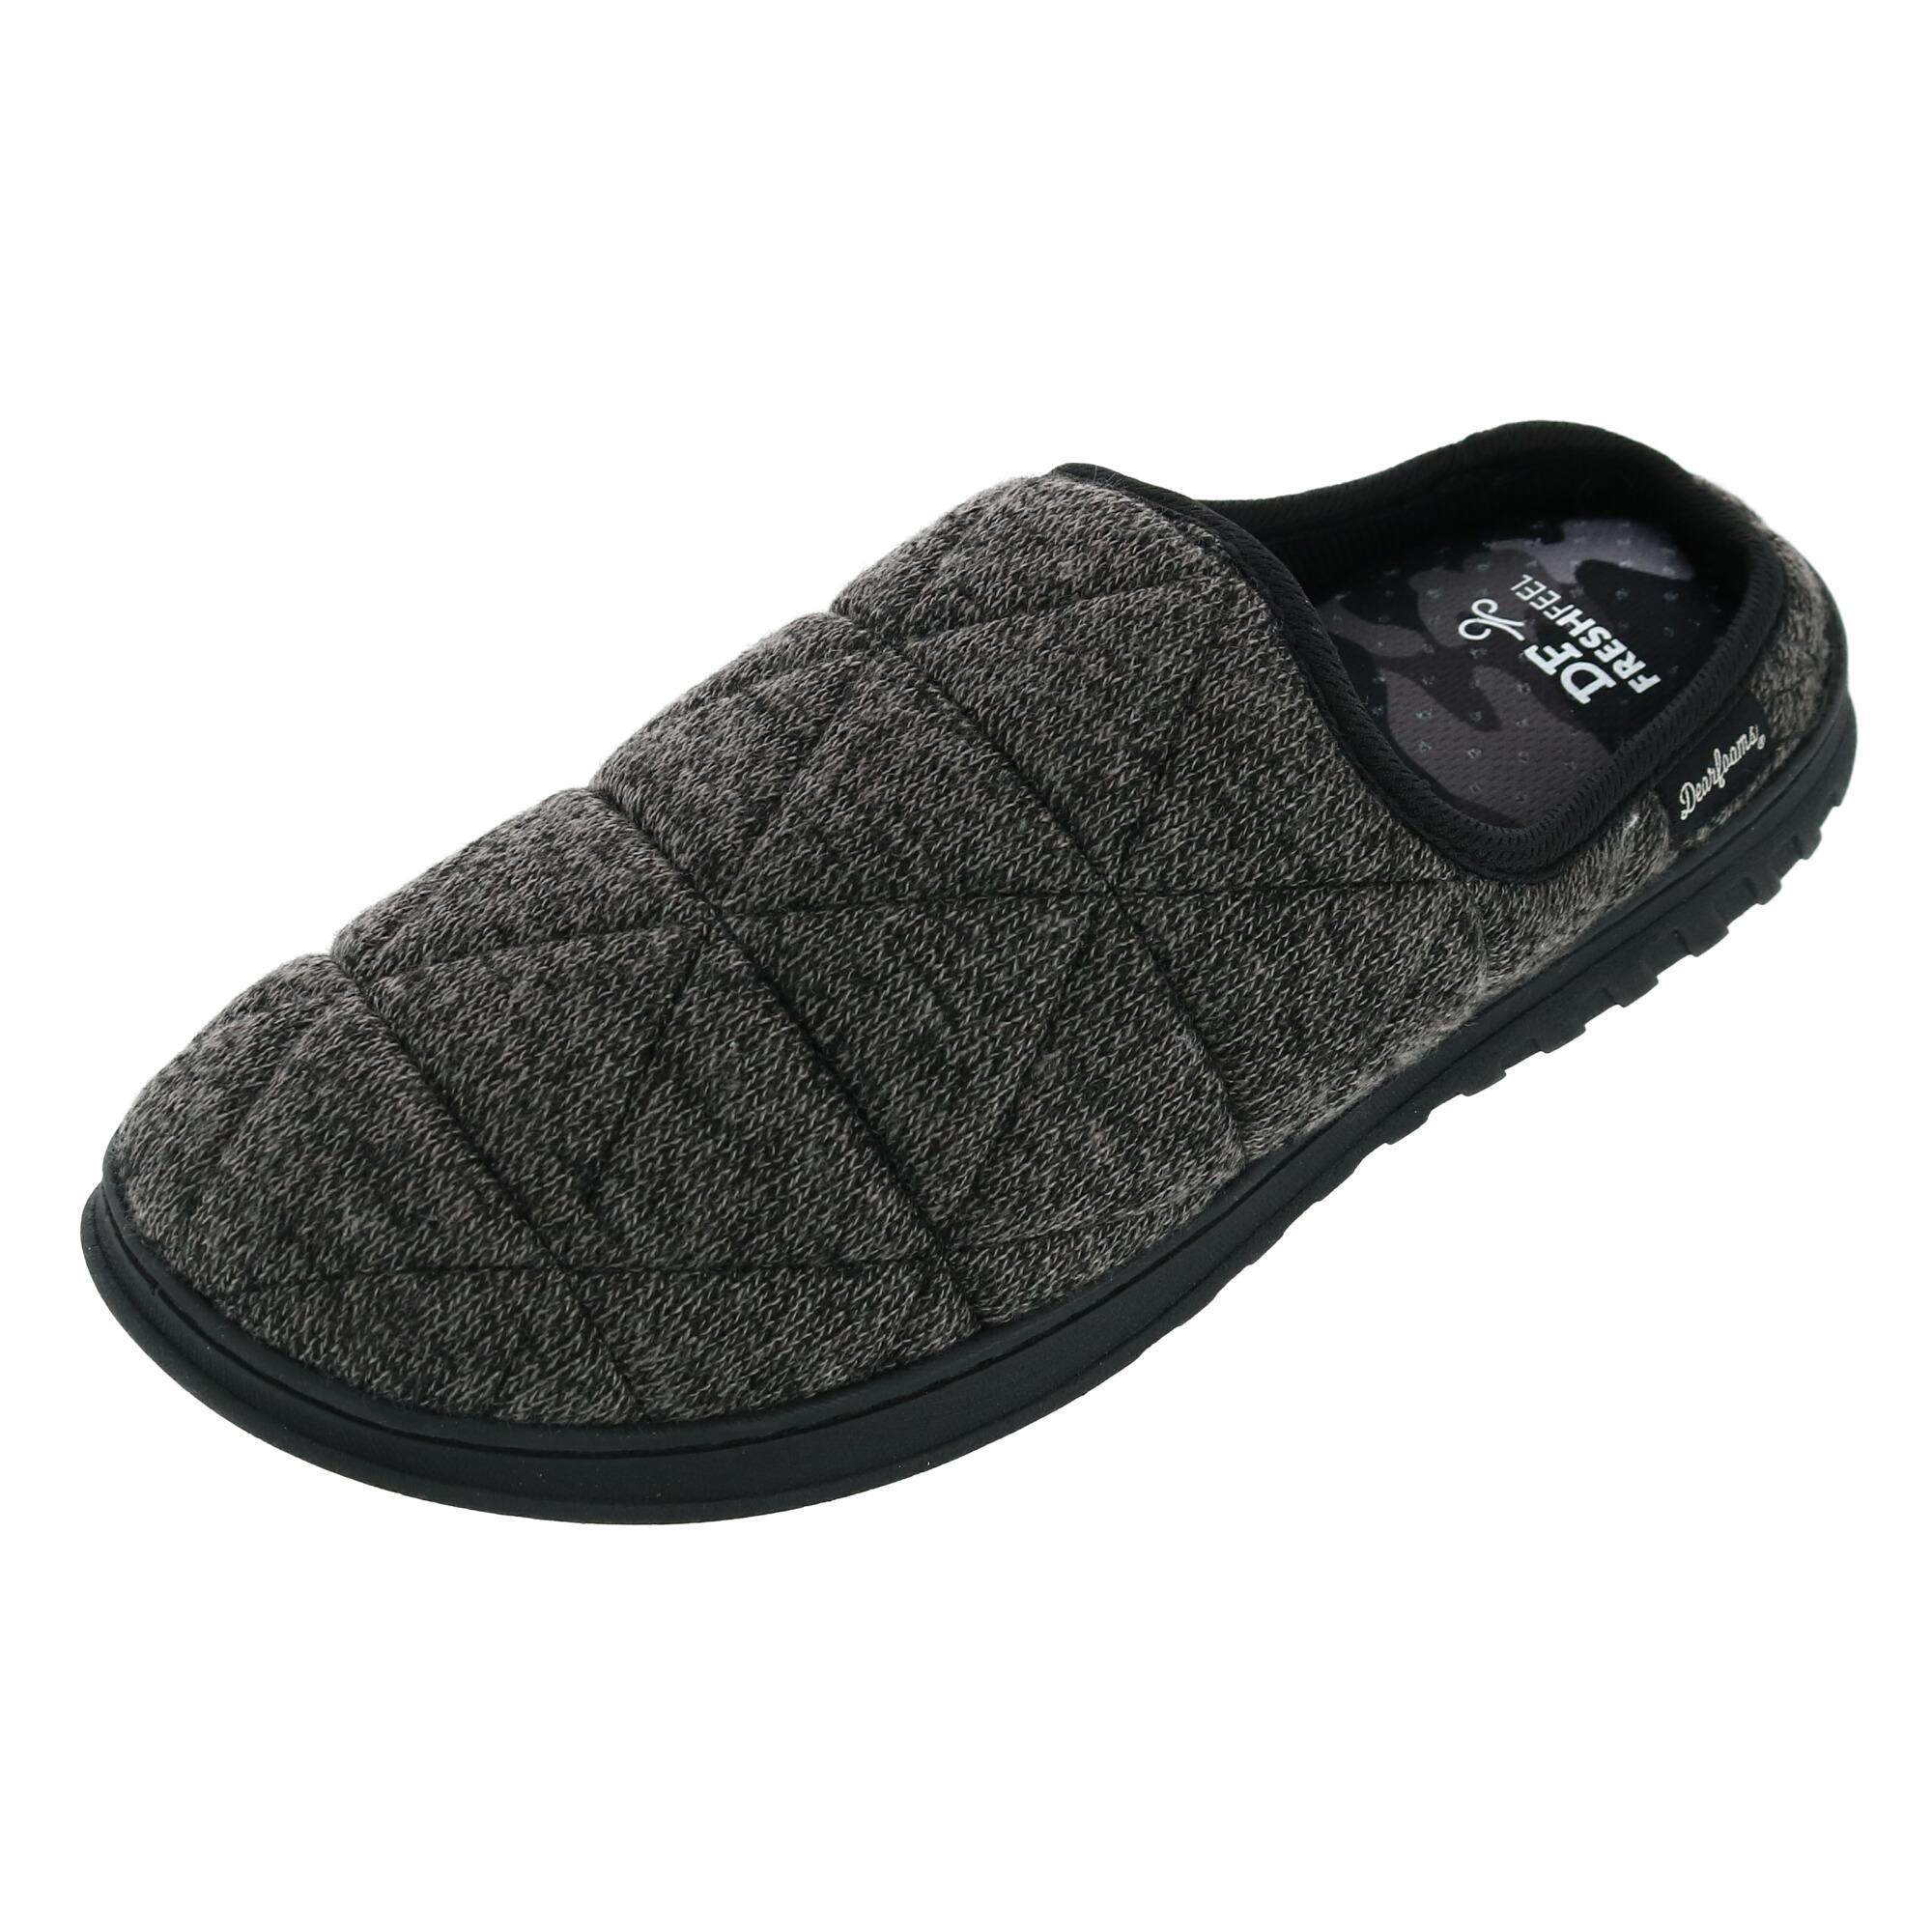 Fanture Men's Memory Foam Slipper Slip On Clog Moccasin Suede RRP $40